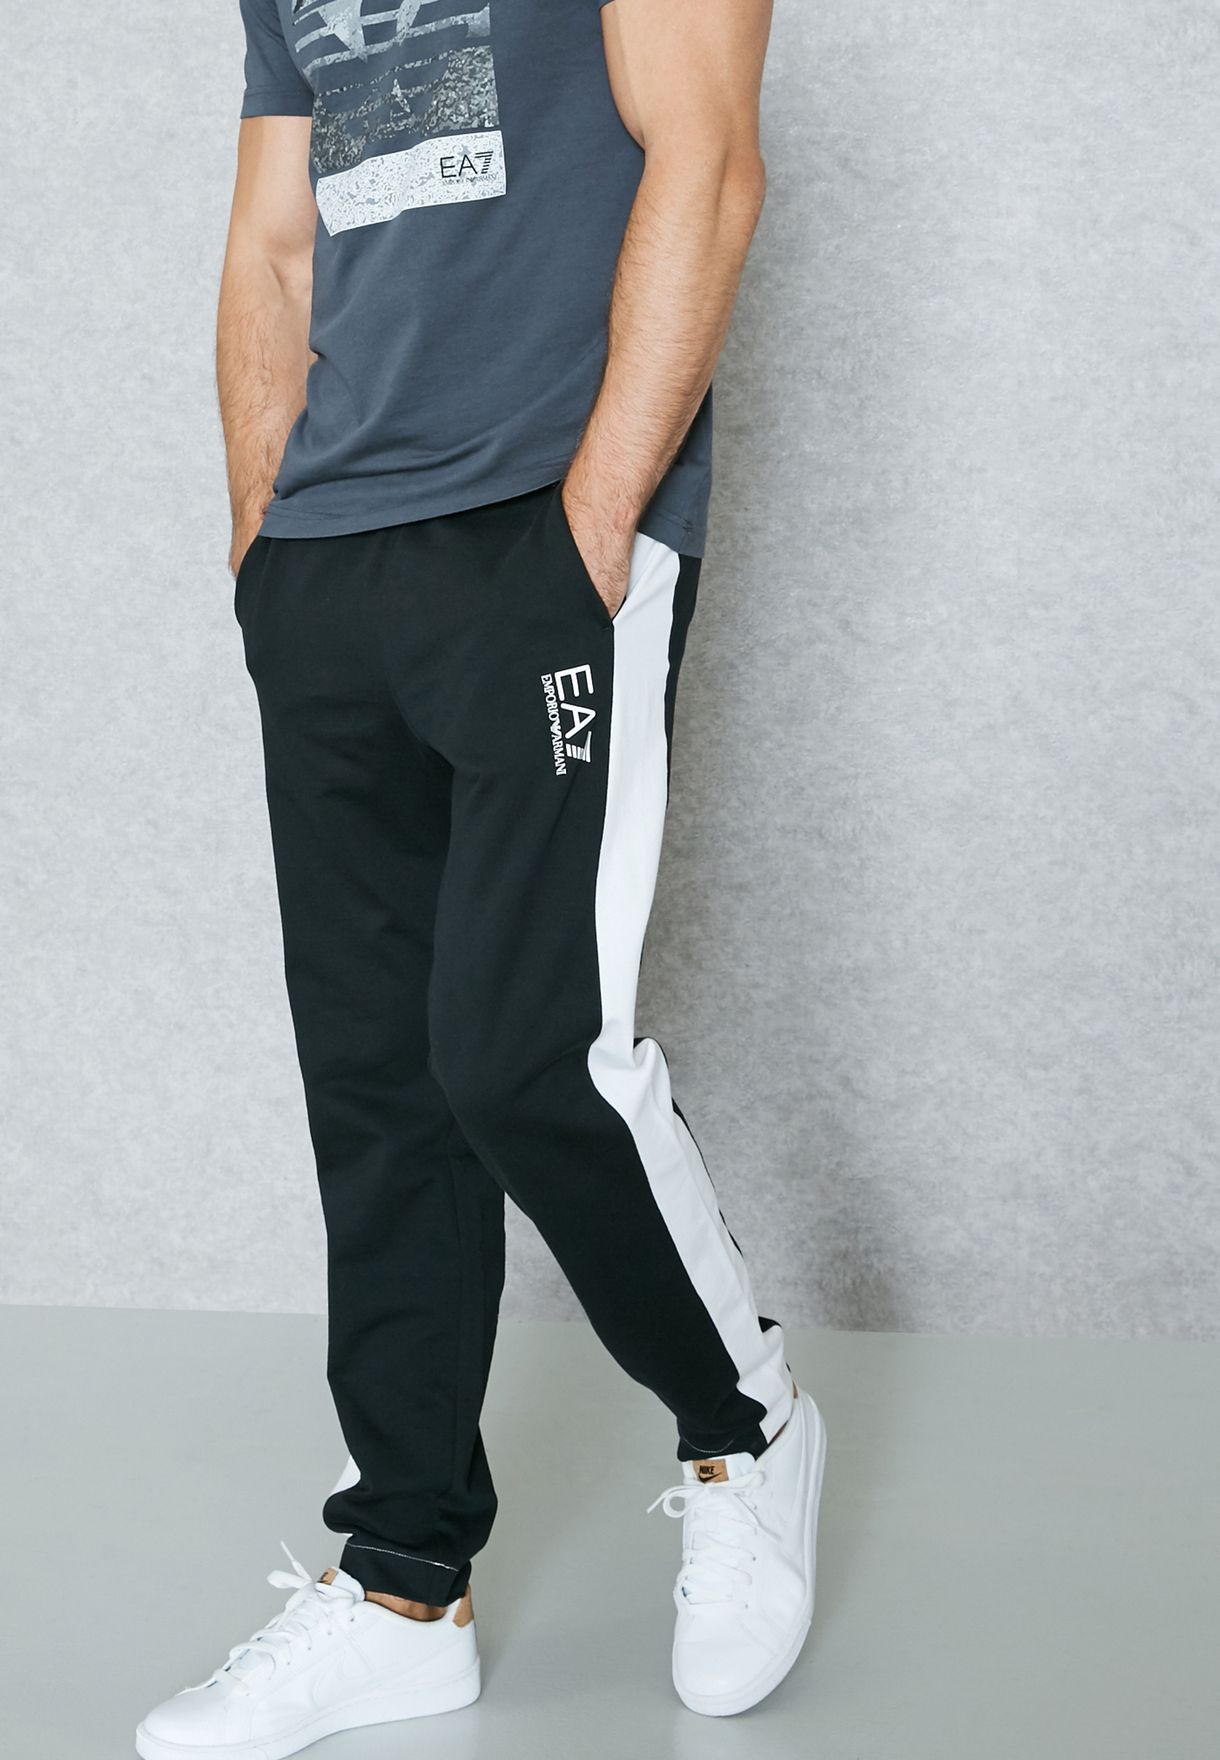 c7946d7ce Shop Ea7 Emporio Armani black Tritonal Logo Sweatpants PJ05Z-3YPP75 ...